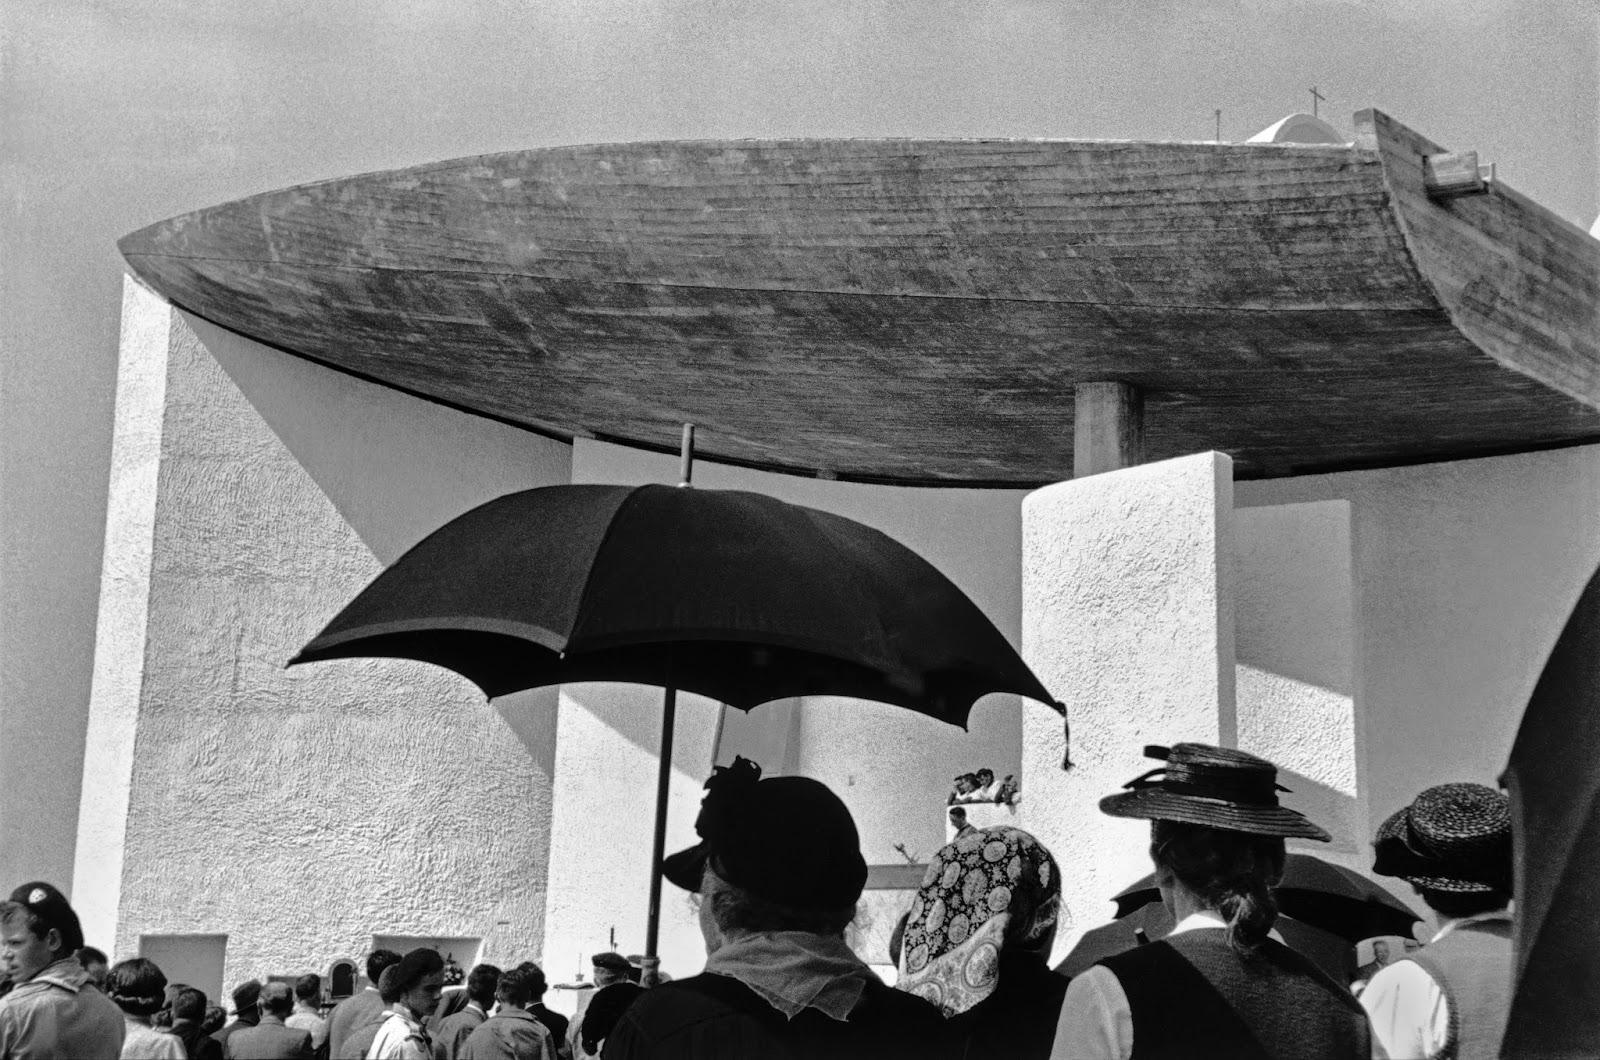 René Burri. Inauguration of the Chapel of Notre Dame du Haut,built by Le Corbusier, Ronchamp, France 1955.Photograph, gelatin silver print on paper.Image: 346 x 524 mm